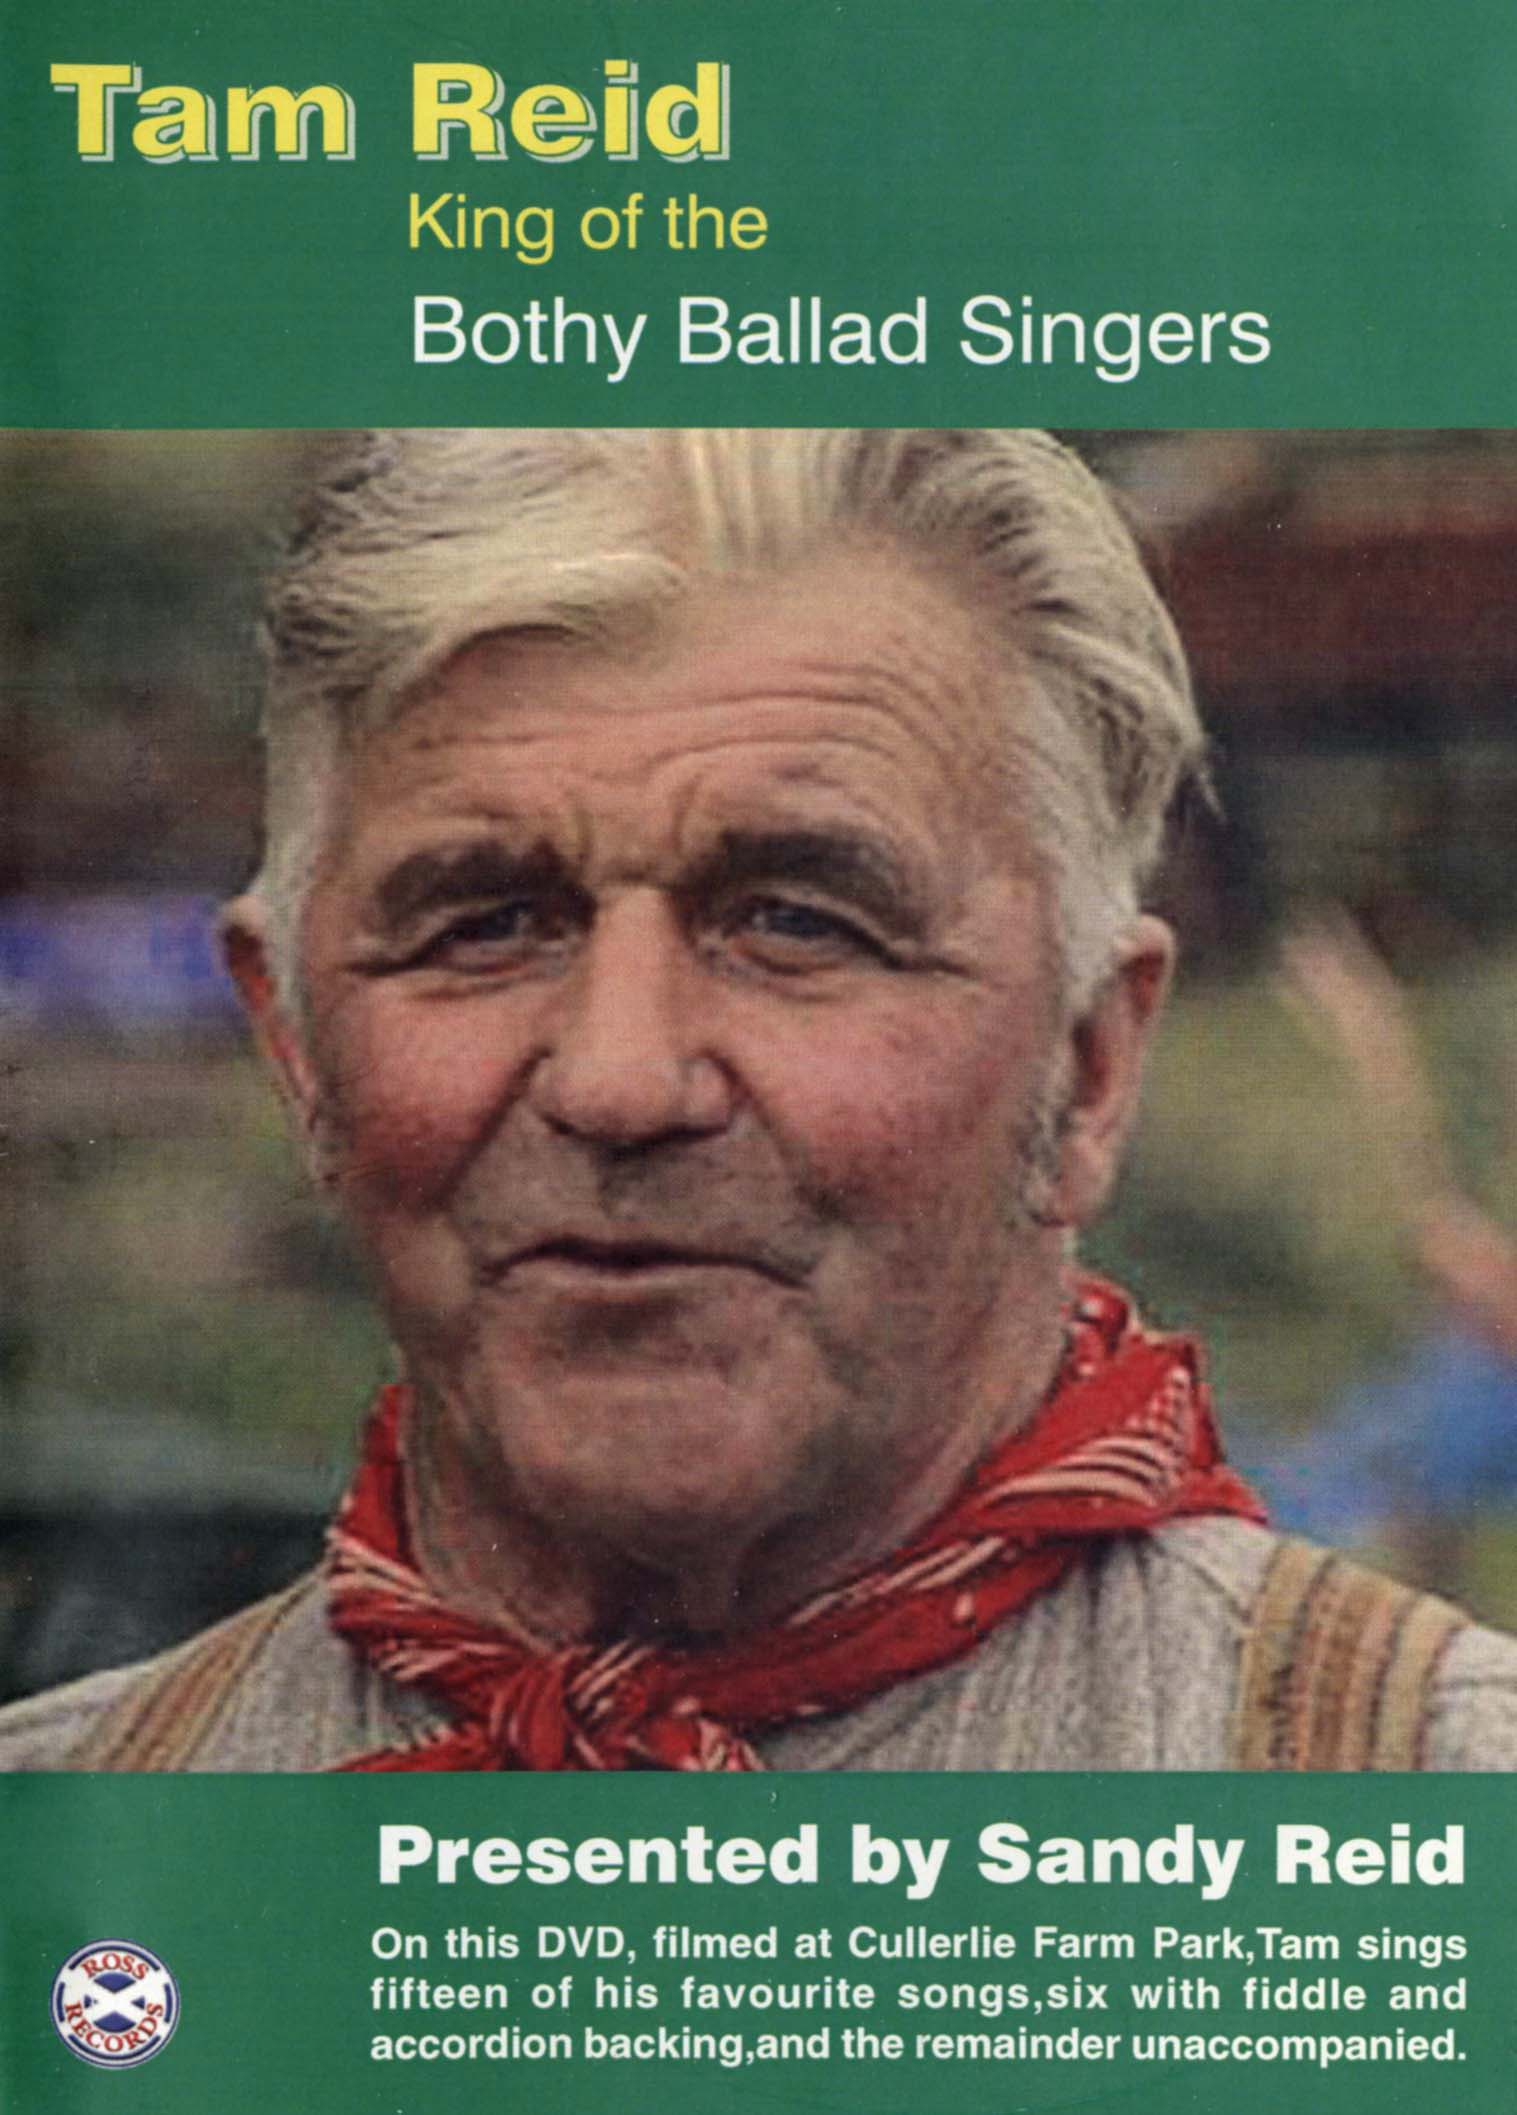 Tam Reid: King of the Bothy Ballad Singers